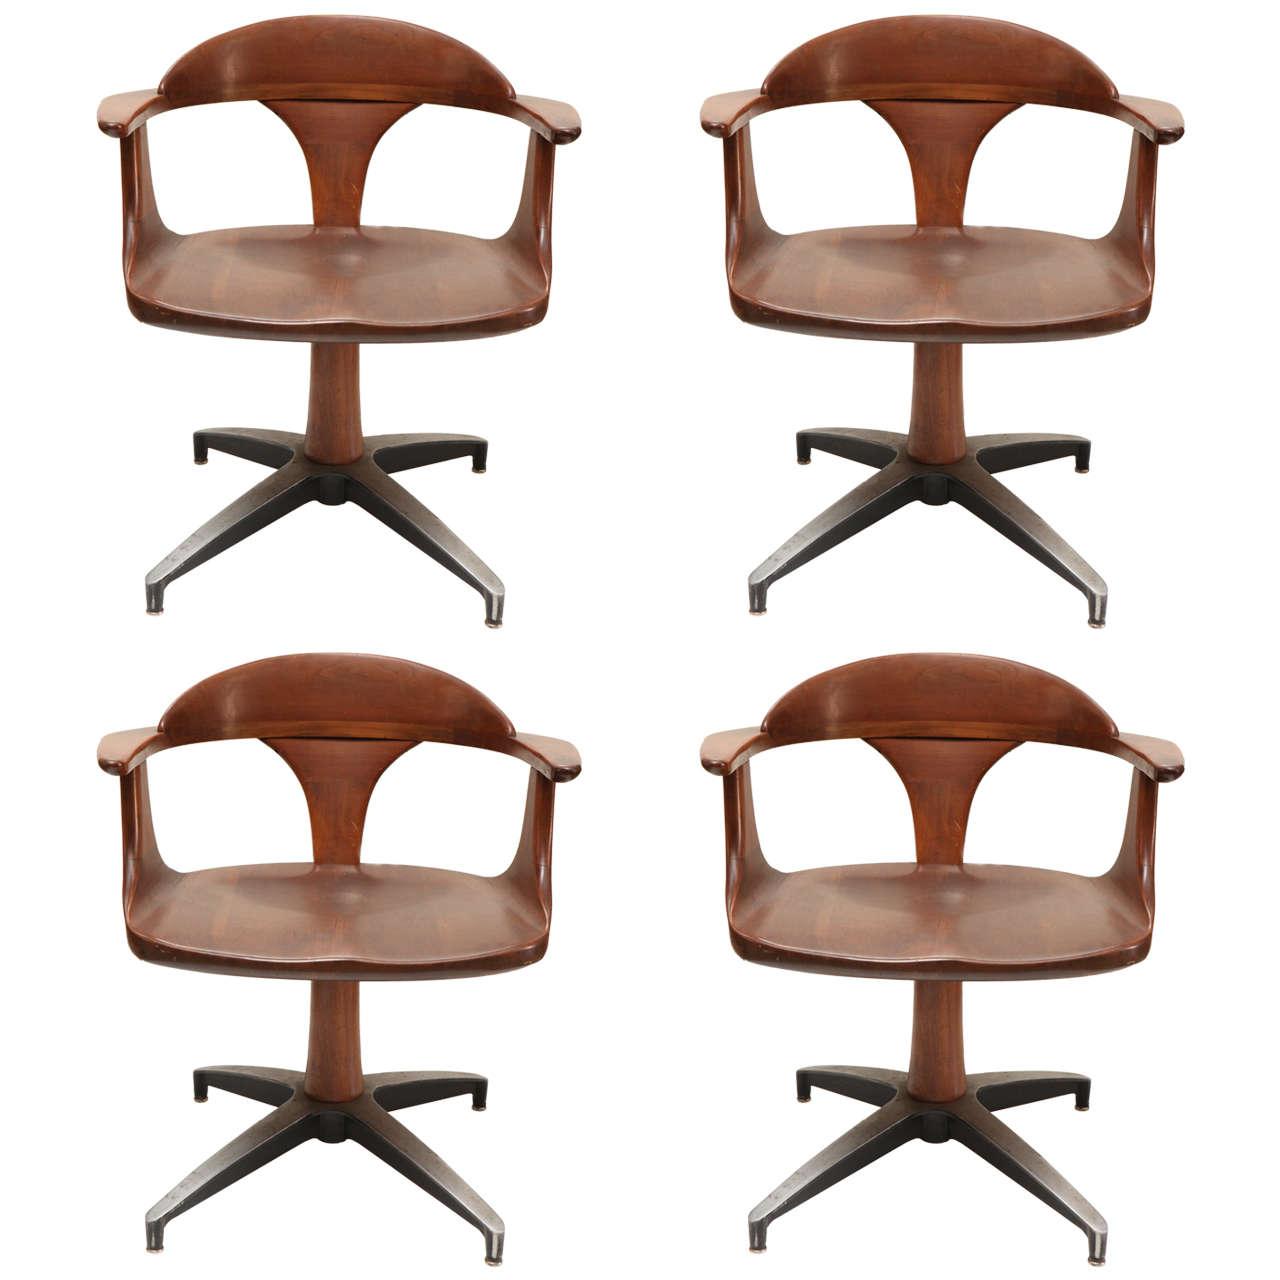 Set of Four Mid Century Walnut Chairs at 1stdibs : X from www.1stdibs.com size 1280 x 1280 jpeg 90kB